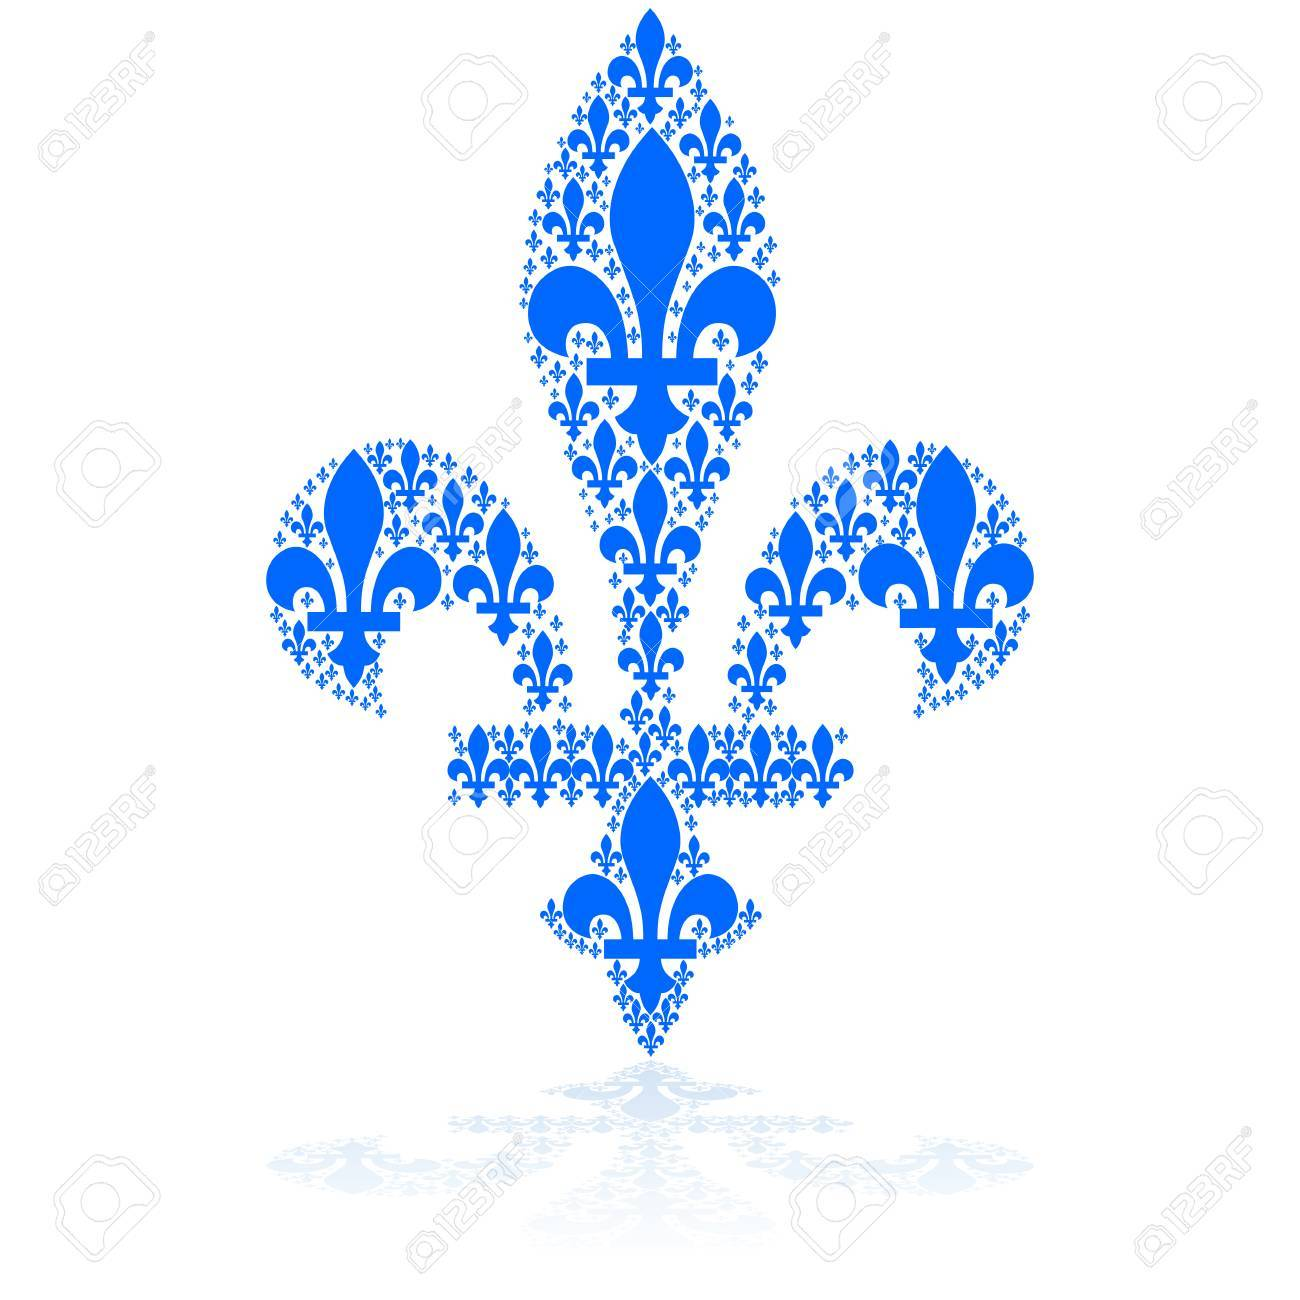 Geliebte Concept Illustration Showing A Blue Fleur-de-lys Icon Made Up @YA_13